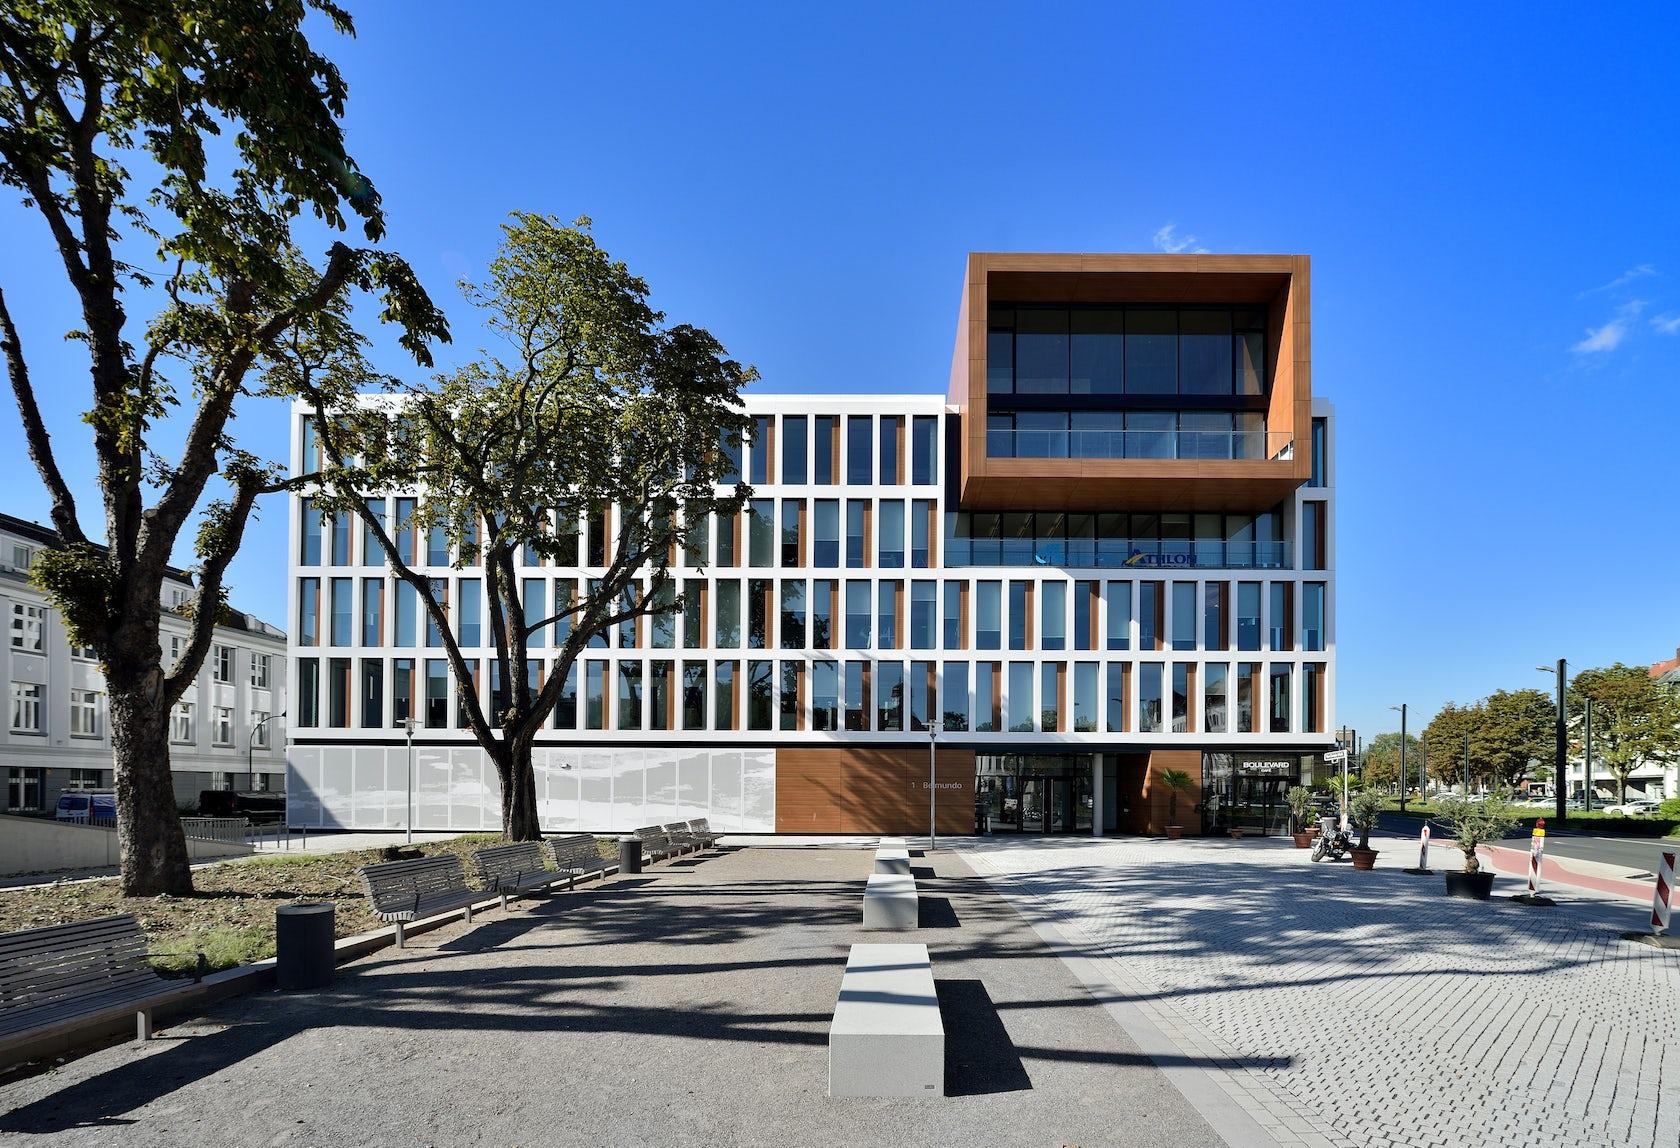 Belsenpark offices architizer - Trivago office dusseldorf ...